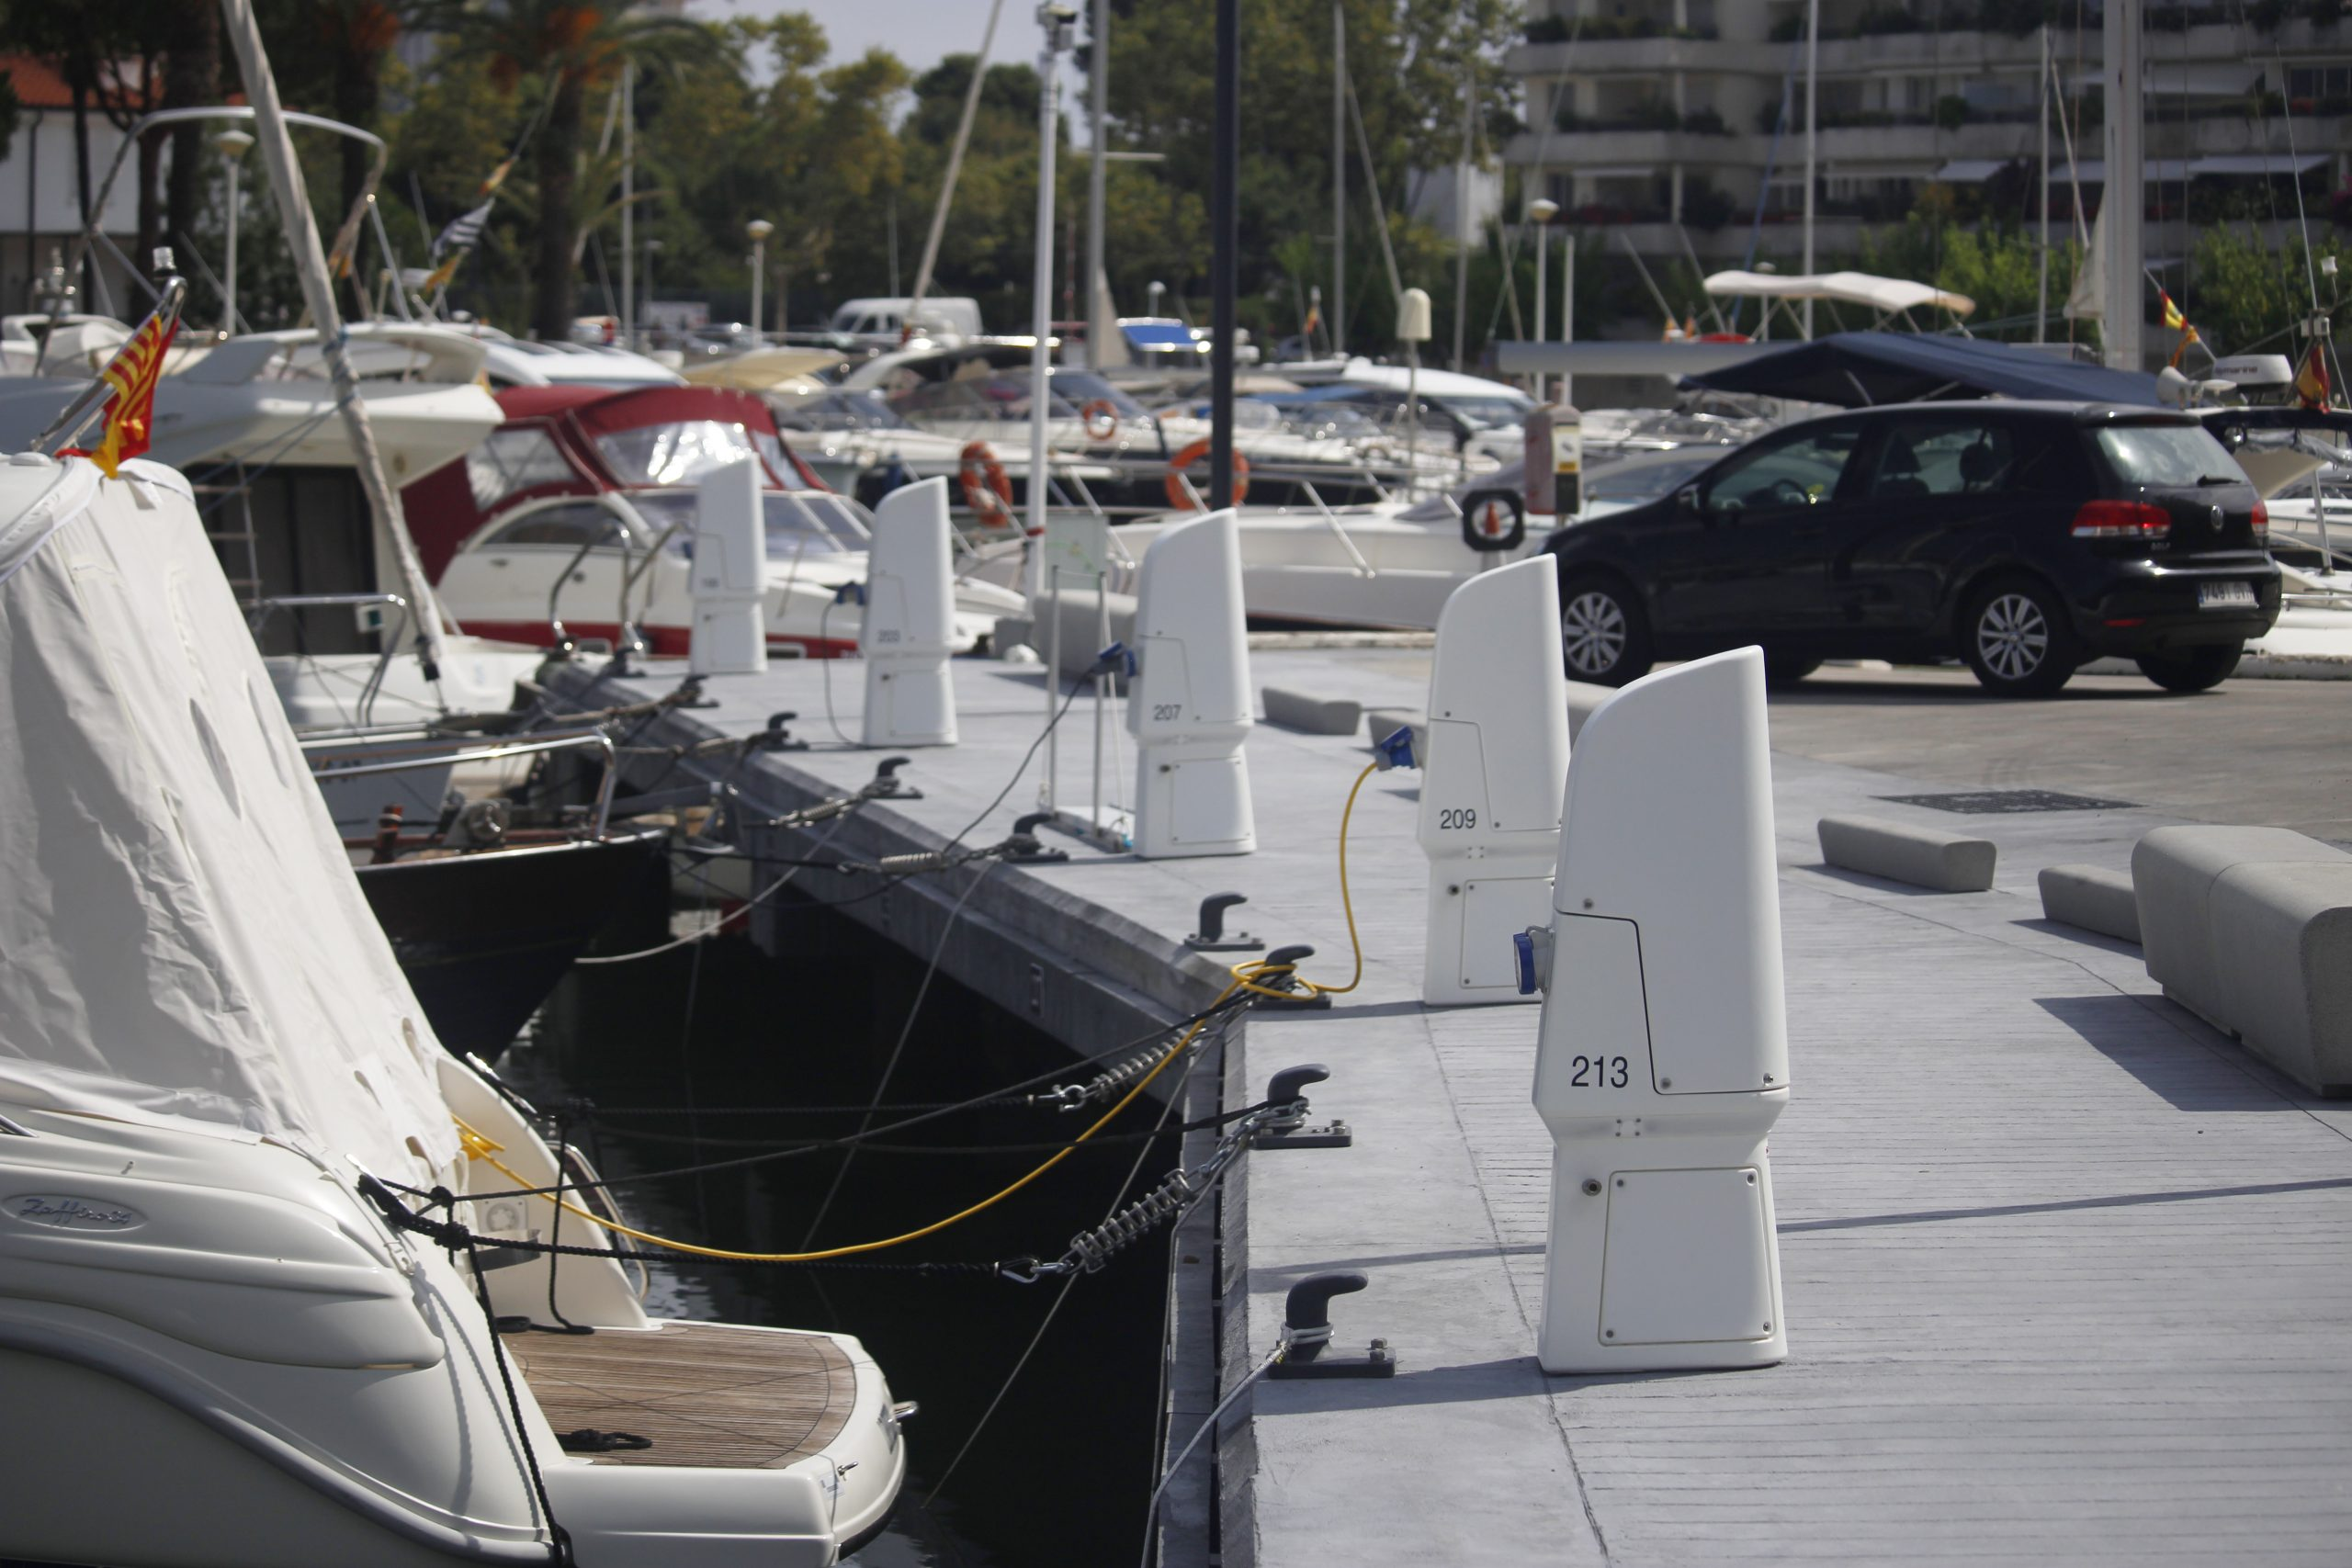 torretas inteligentes náutica de recreo